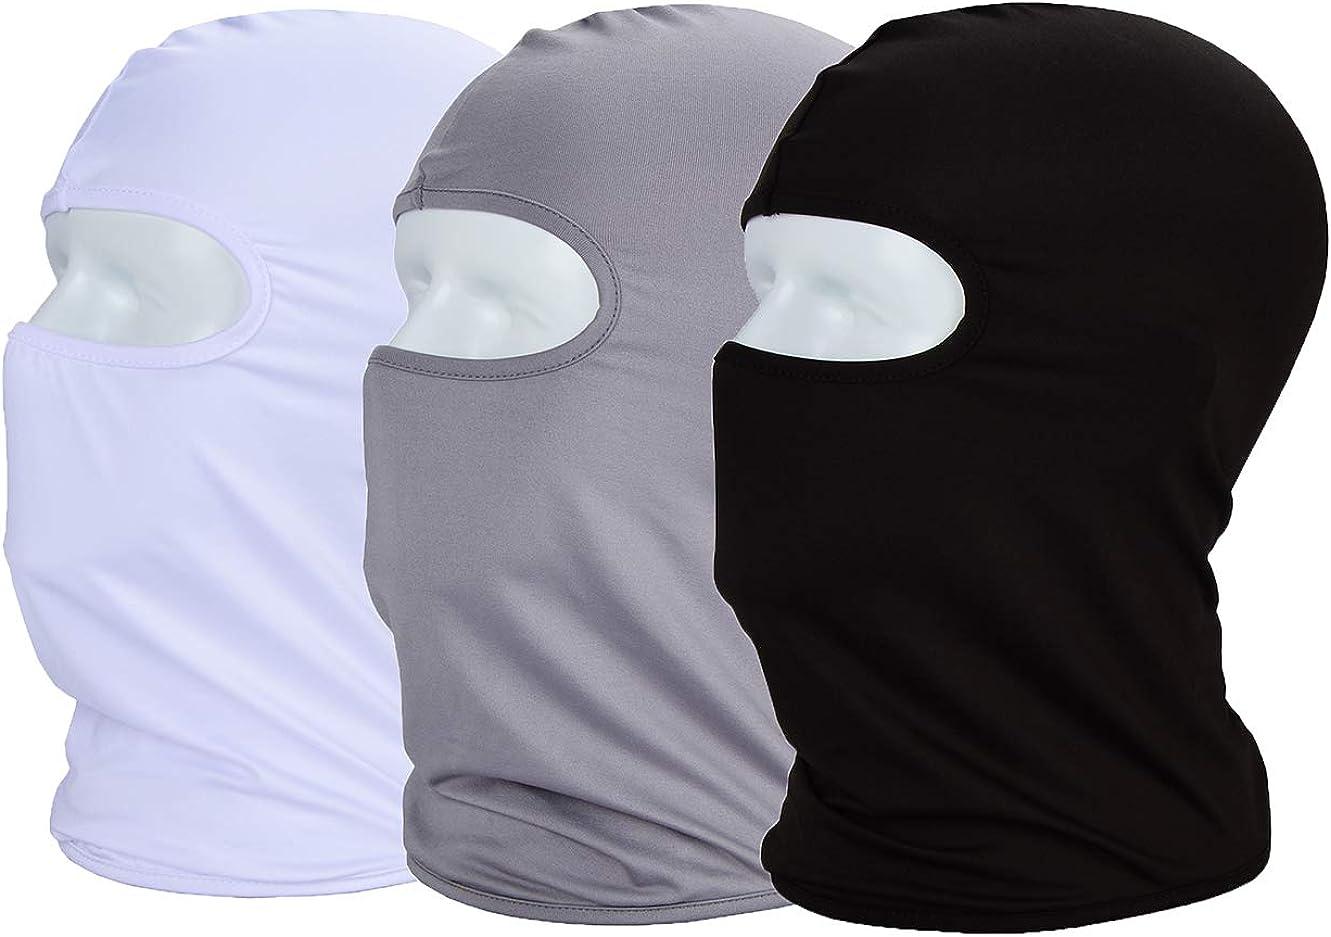 MAYOUTH Balaclava Sun/uv face mask UPF 50+ ski mask Neck Gaiter face Scarf Outdoor Sports 3pack